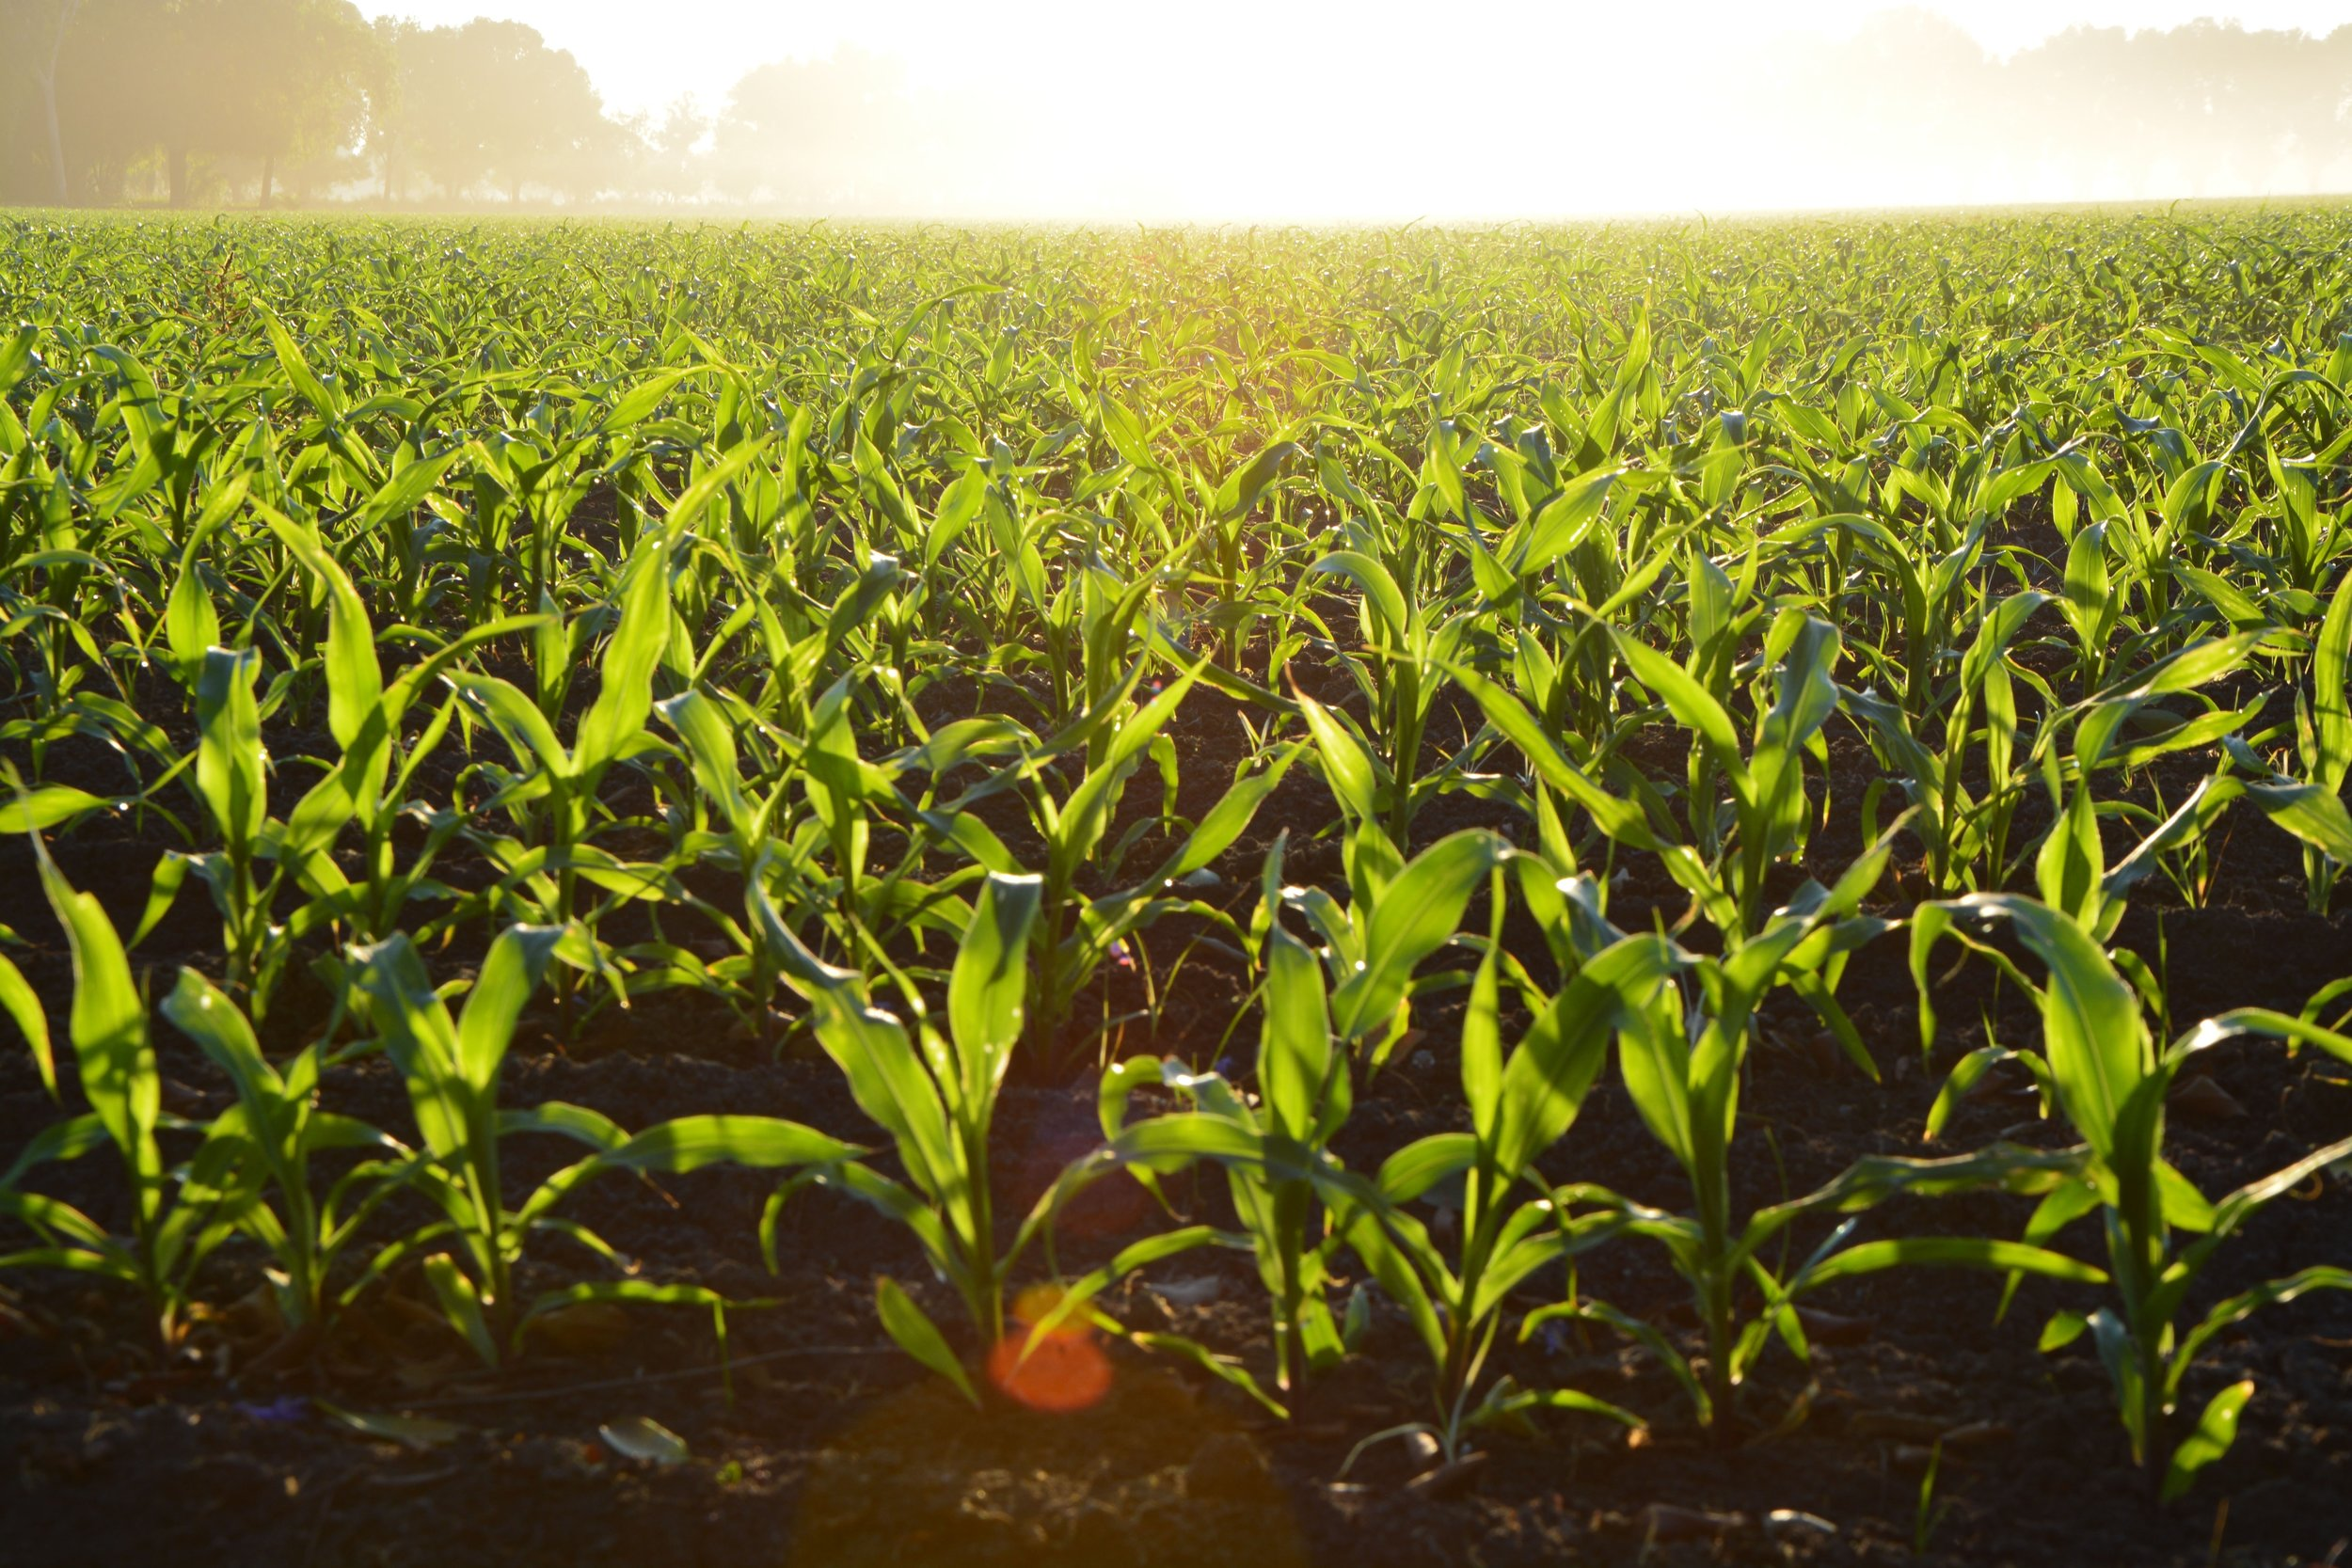 corn-cropland-crops-96715.jpg